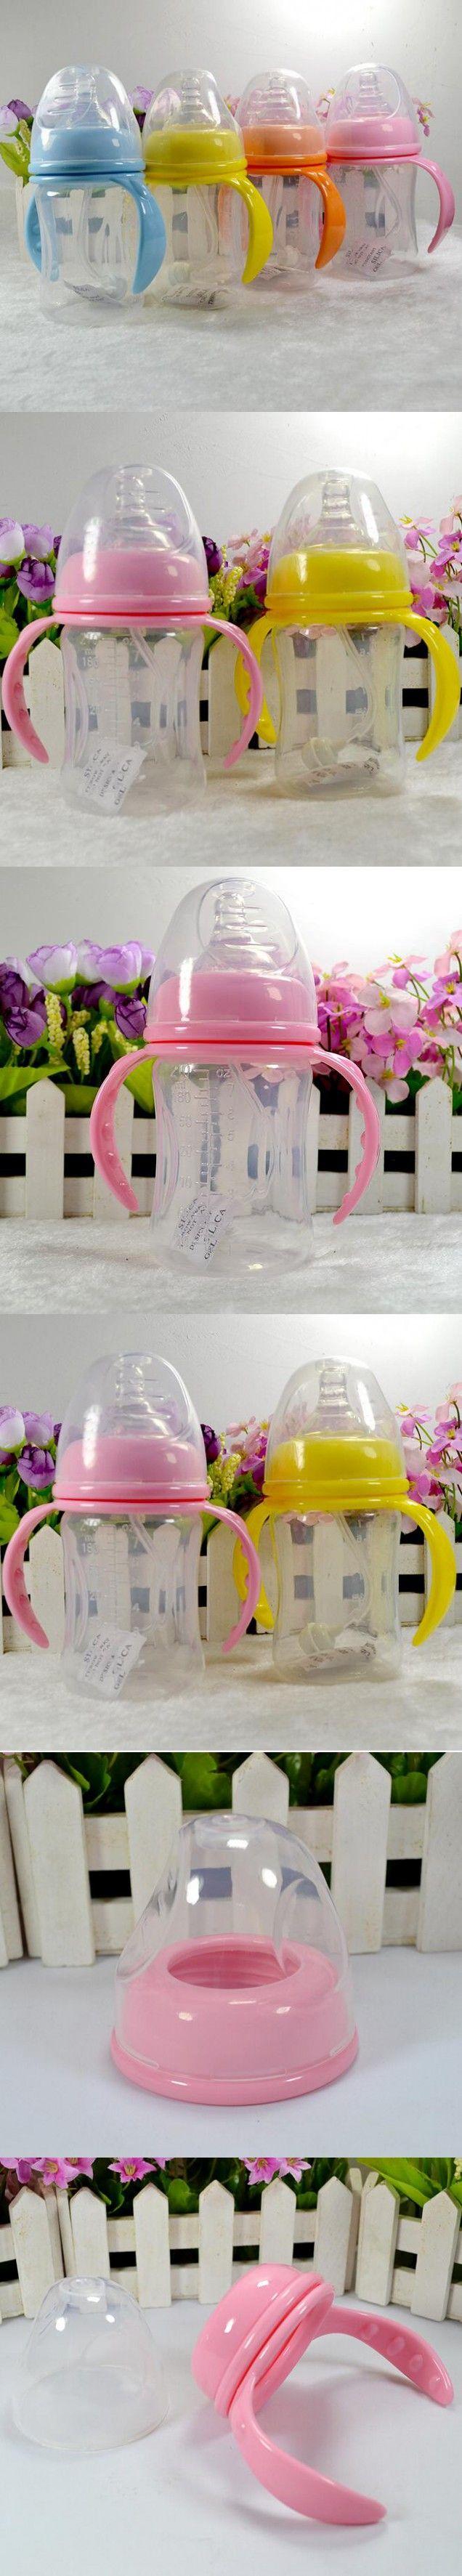 180ML 240ML 320ML wide neck pp baby feeding bottle manufacturer Plastic Baby bottle ready for sublimation